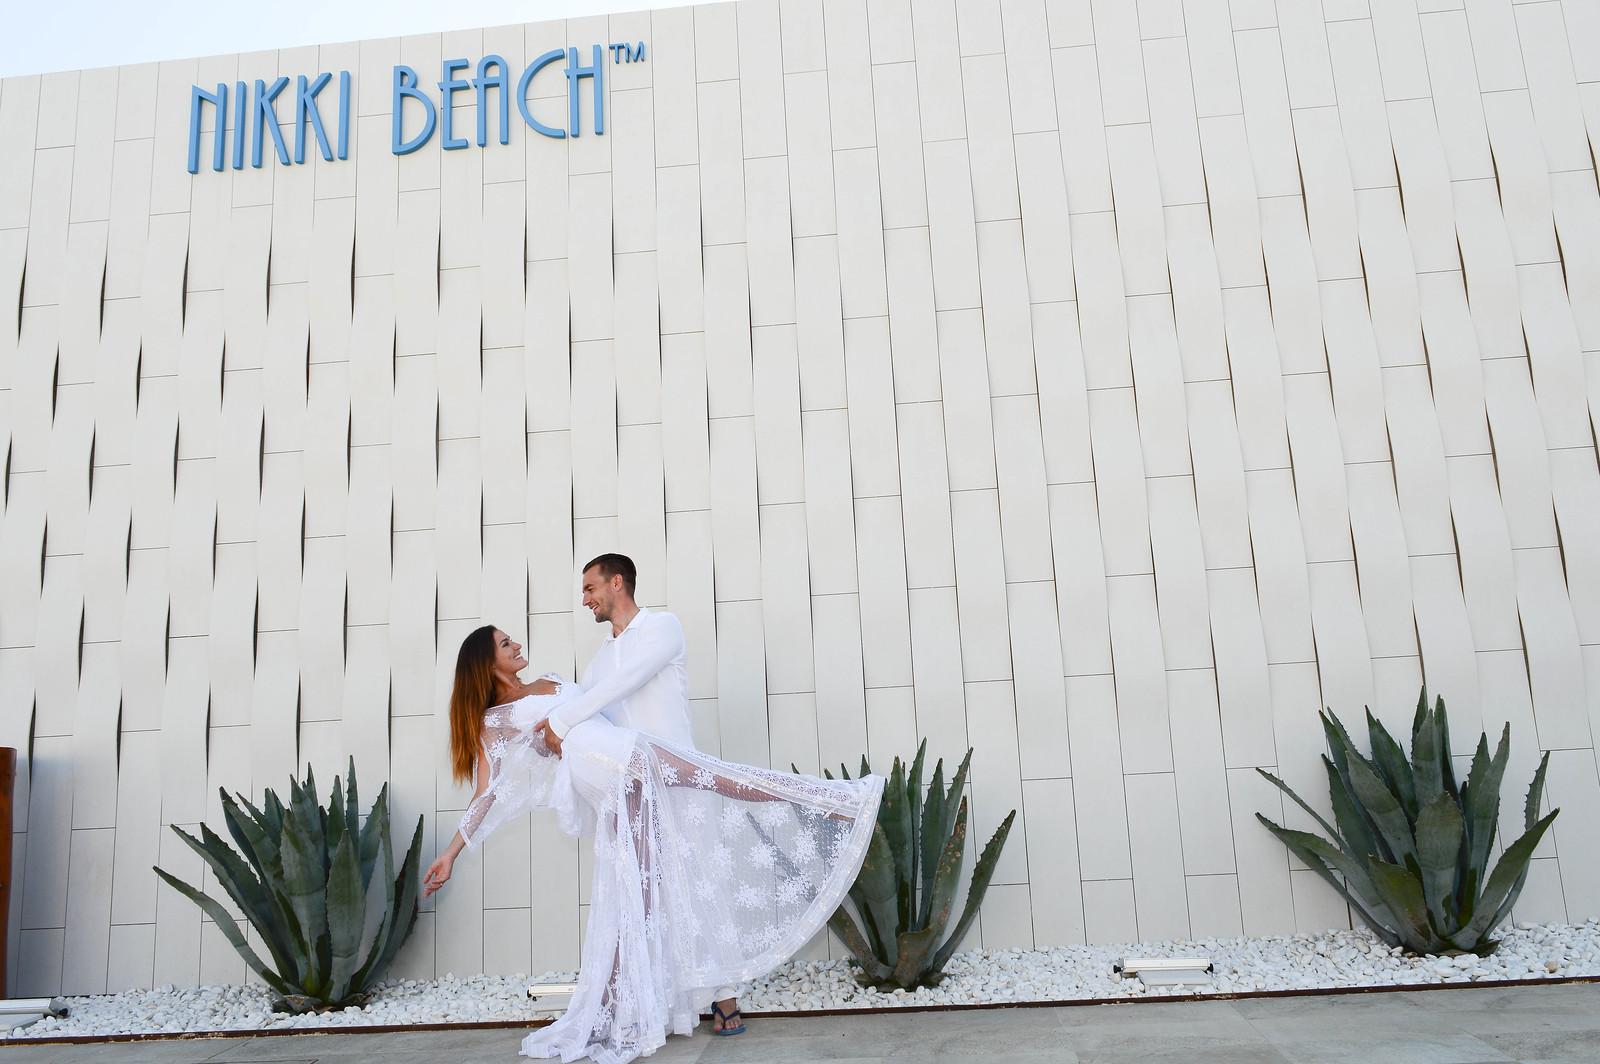 https://www.white-ibiza.com/wp-content/uploads/2020/07/white-ibiza-wedding-venue-nikki-beach-ibiza-2020-03.jpg